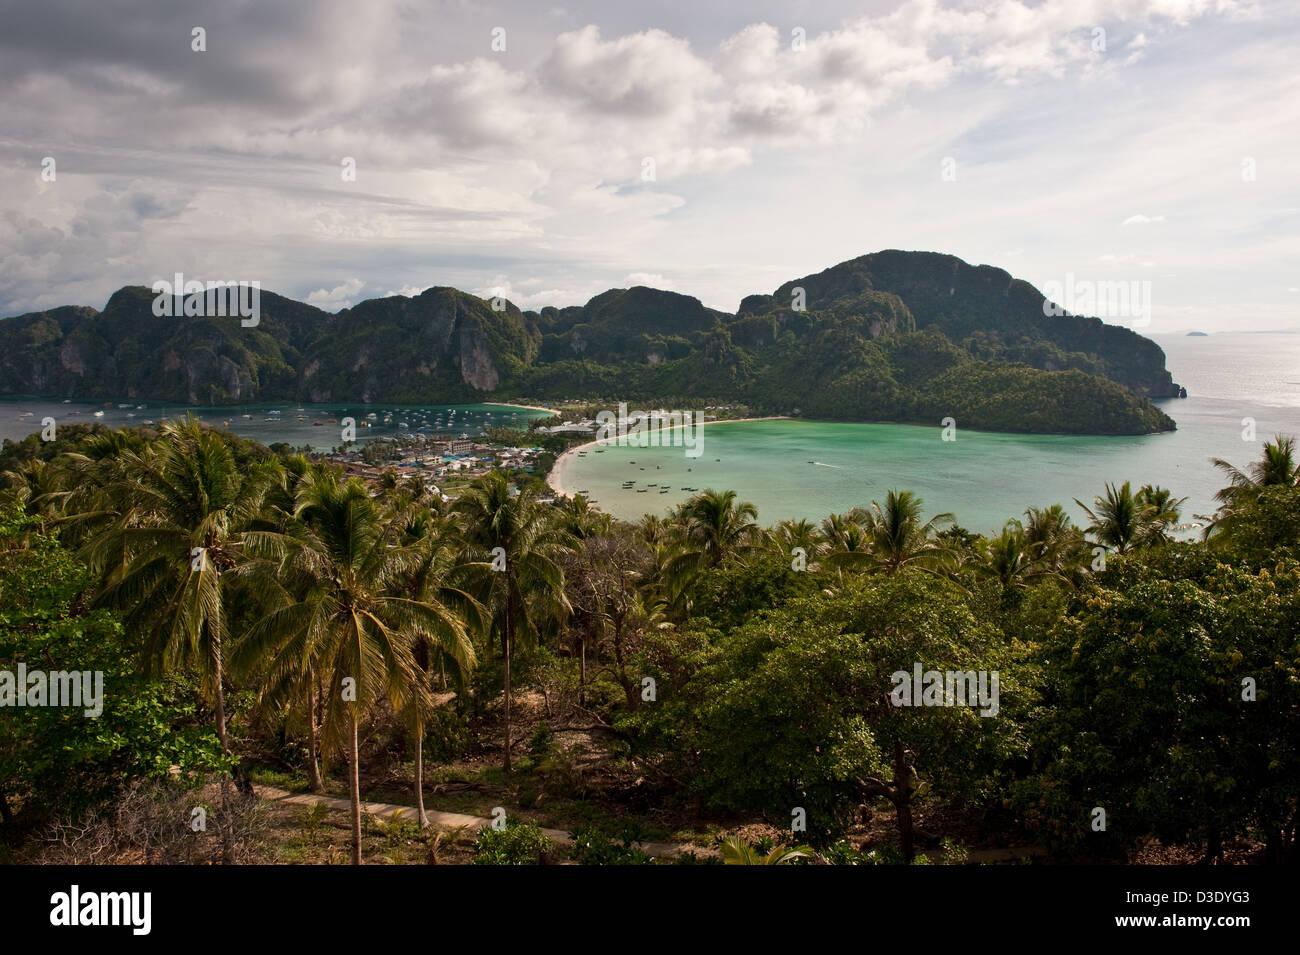 Phi Phi Islands Beaches Loh Dalum Tonsai Bay Long Beach: Phi Phi Iceland Stock Photos & Phi Phi Iceland Stock